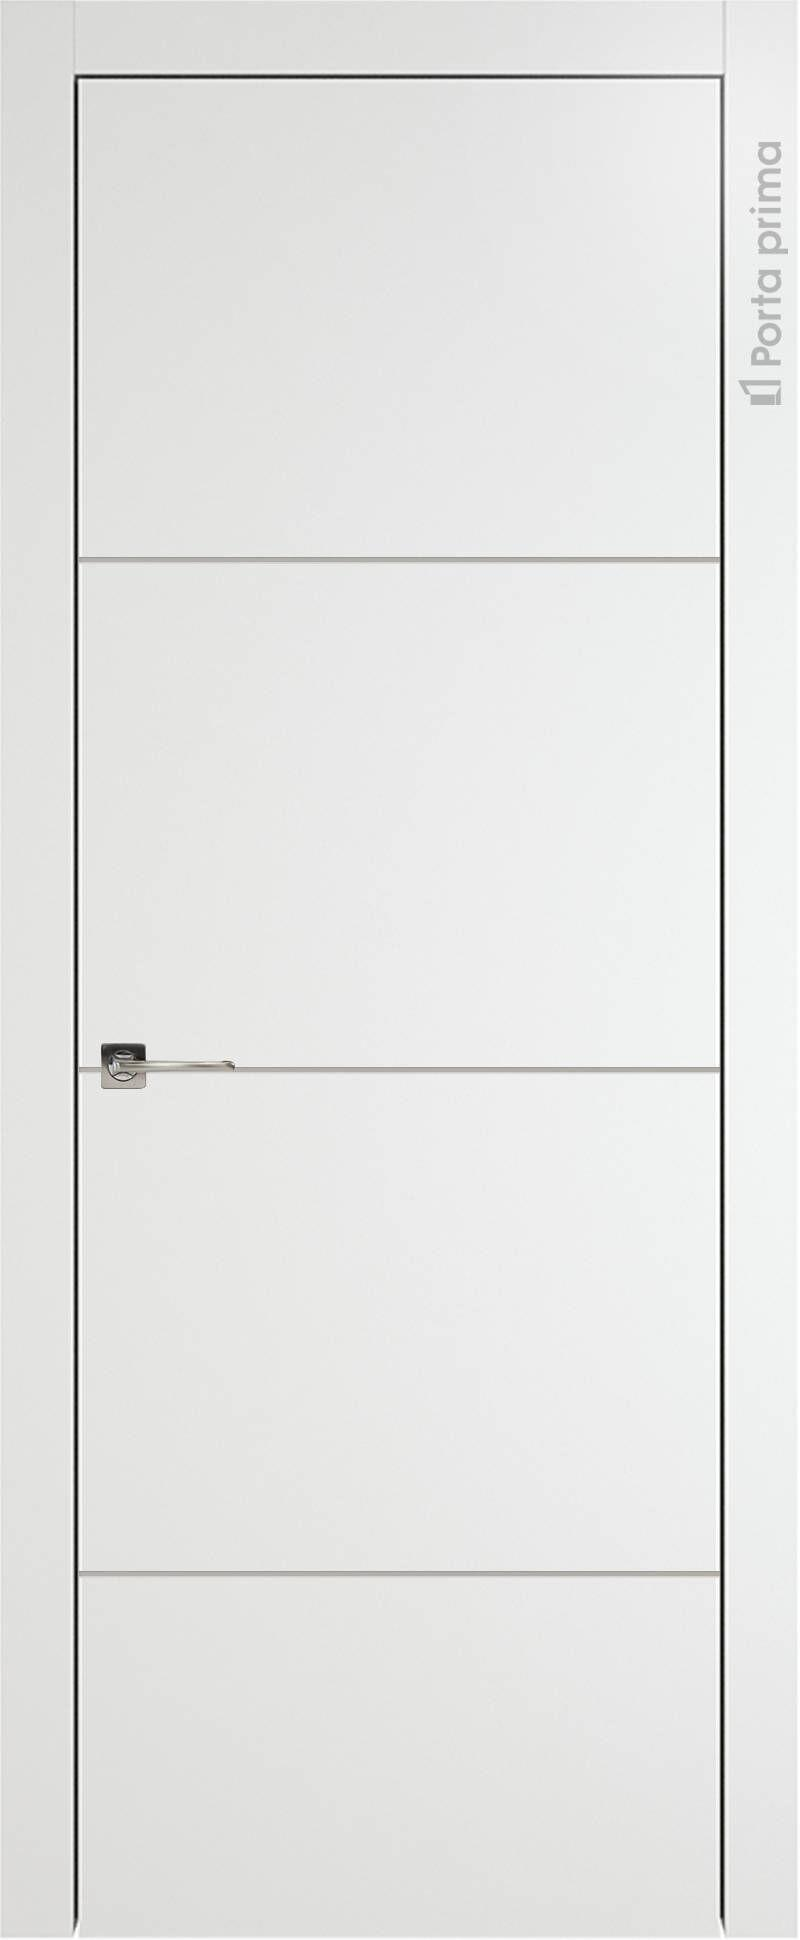 Tivoli Г-2 цвет - Белая эмаль (RAL 9003) Без стекла (ДГ)